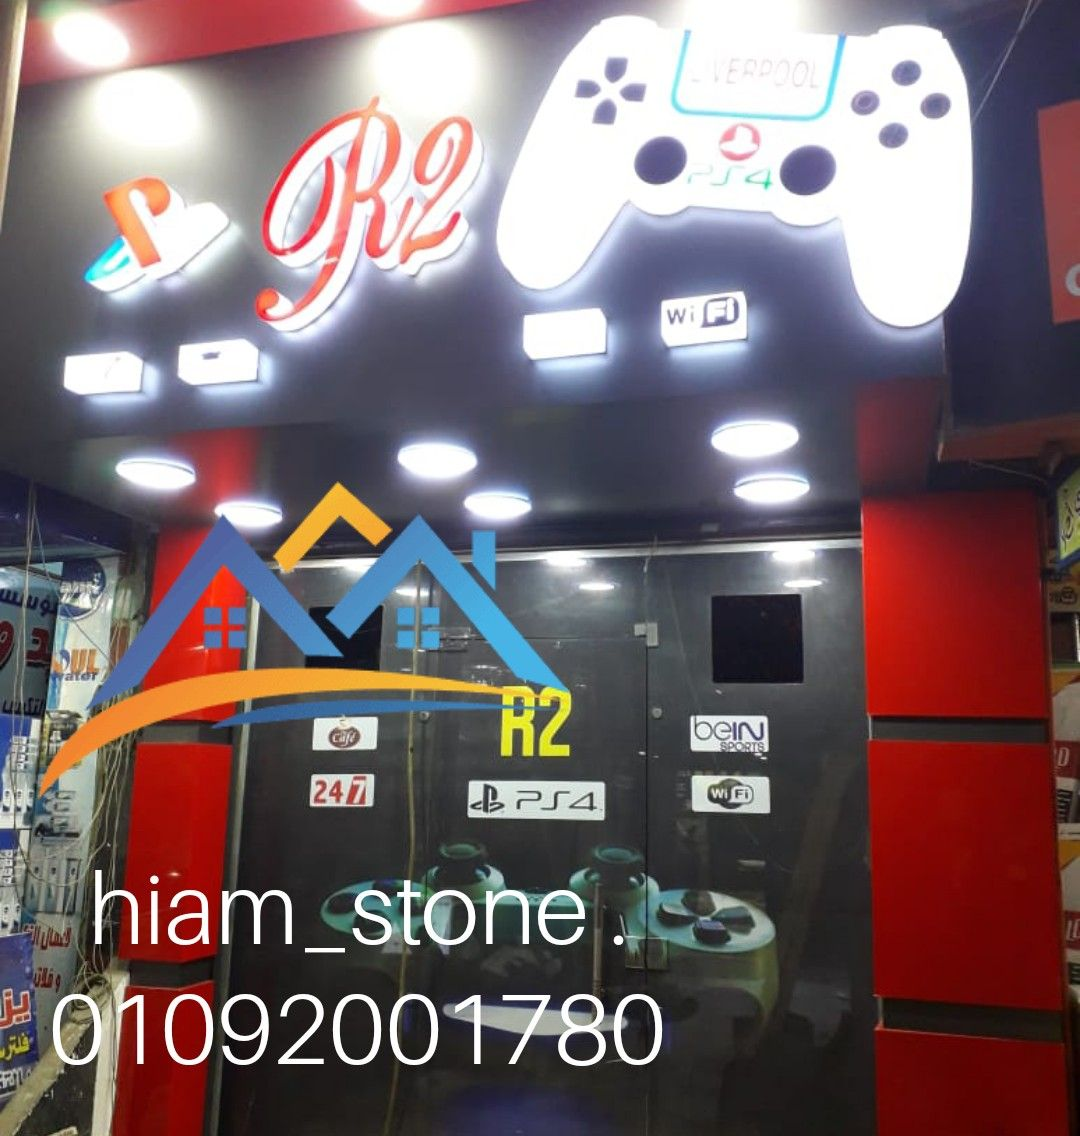 الواح كلادينج محلات فى مصر 01092001780 Gaming Products Arcade Arcade Games